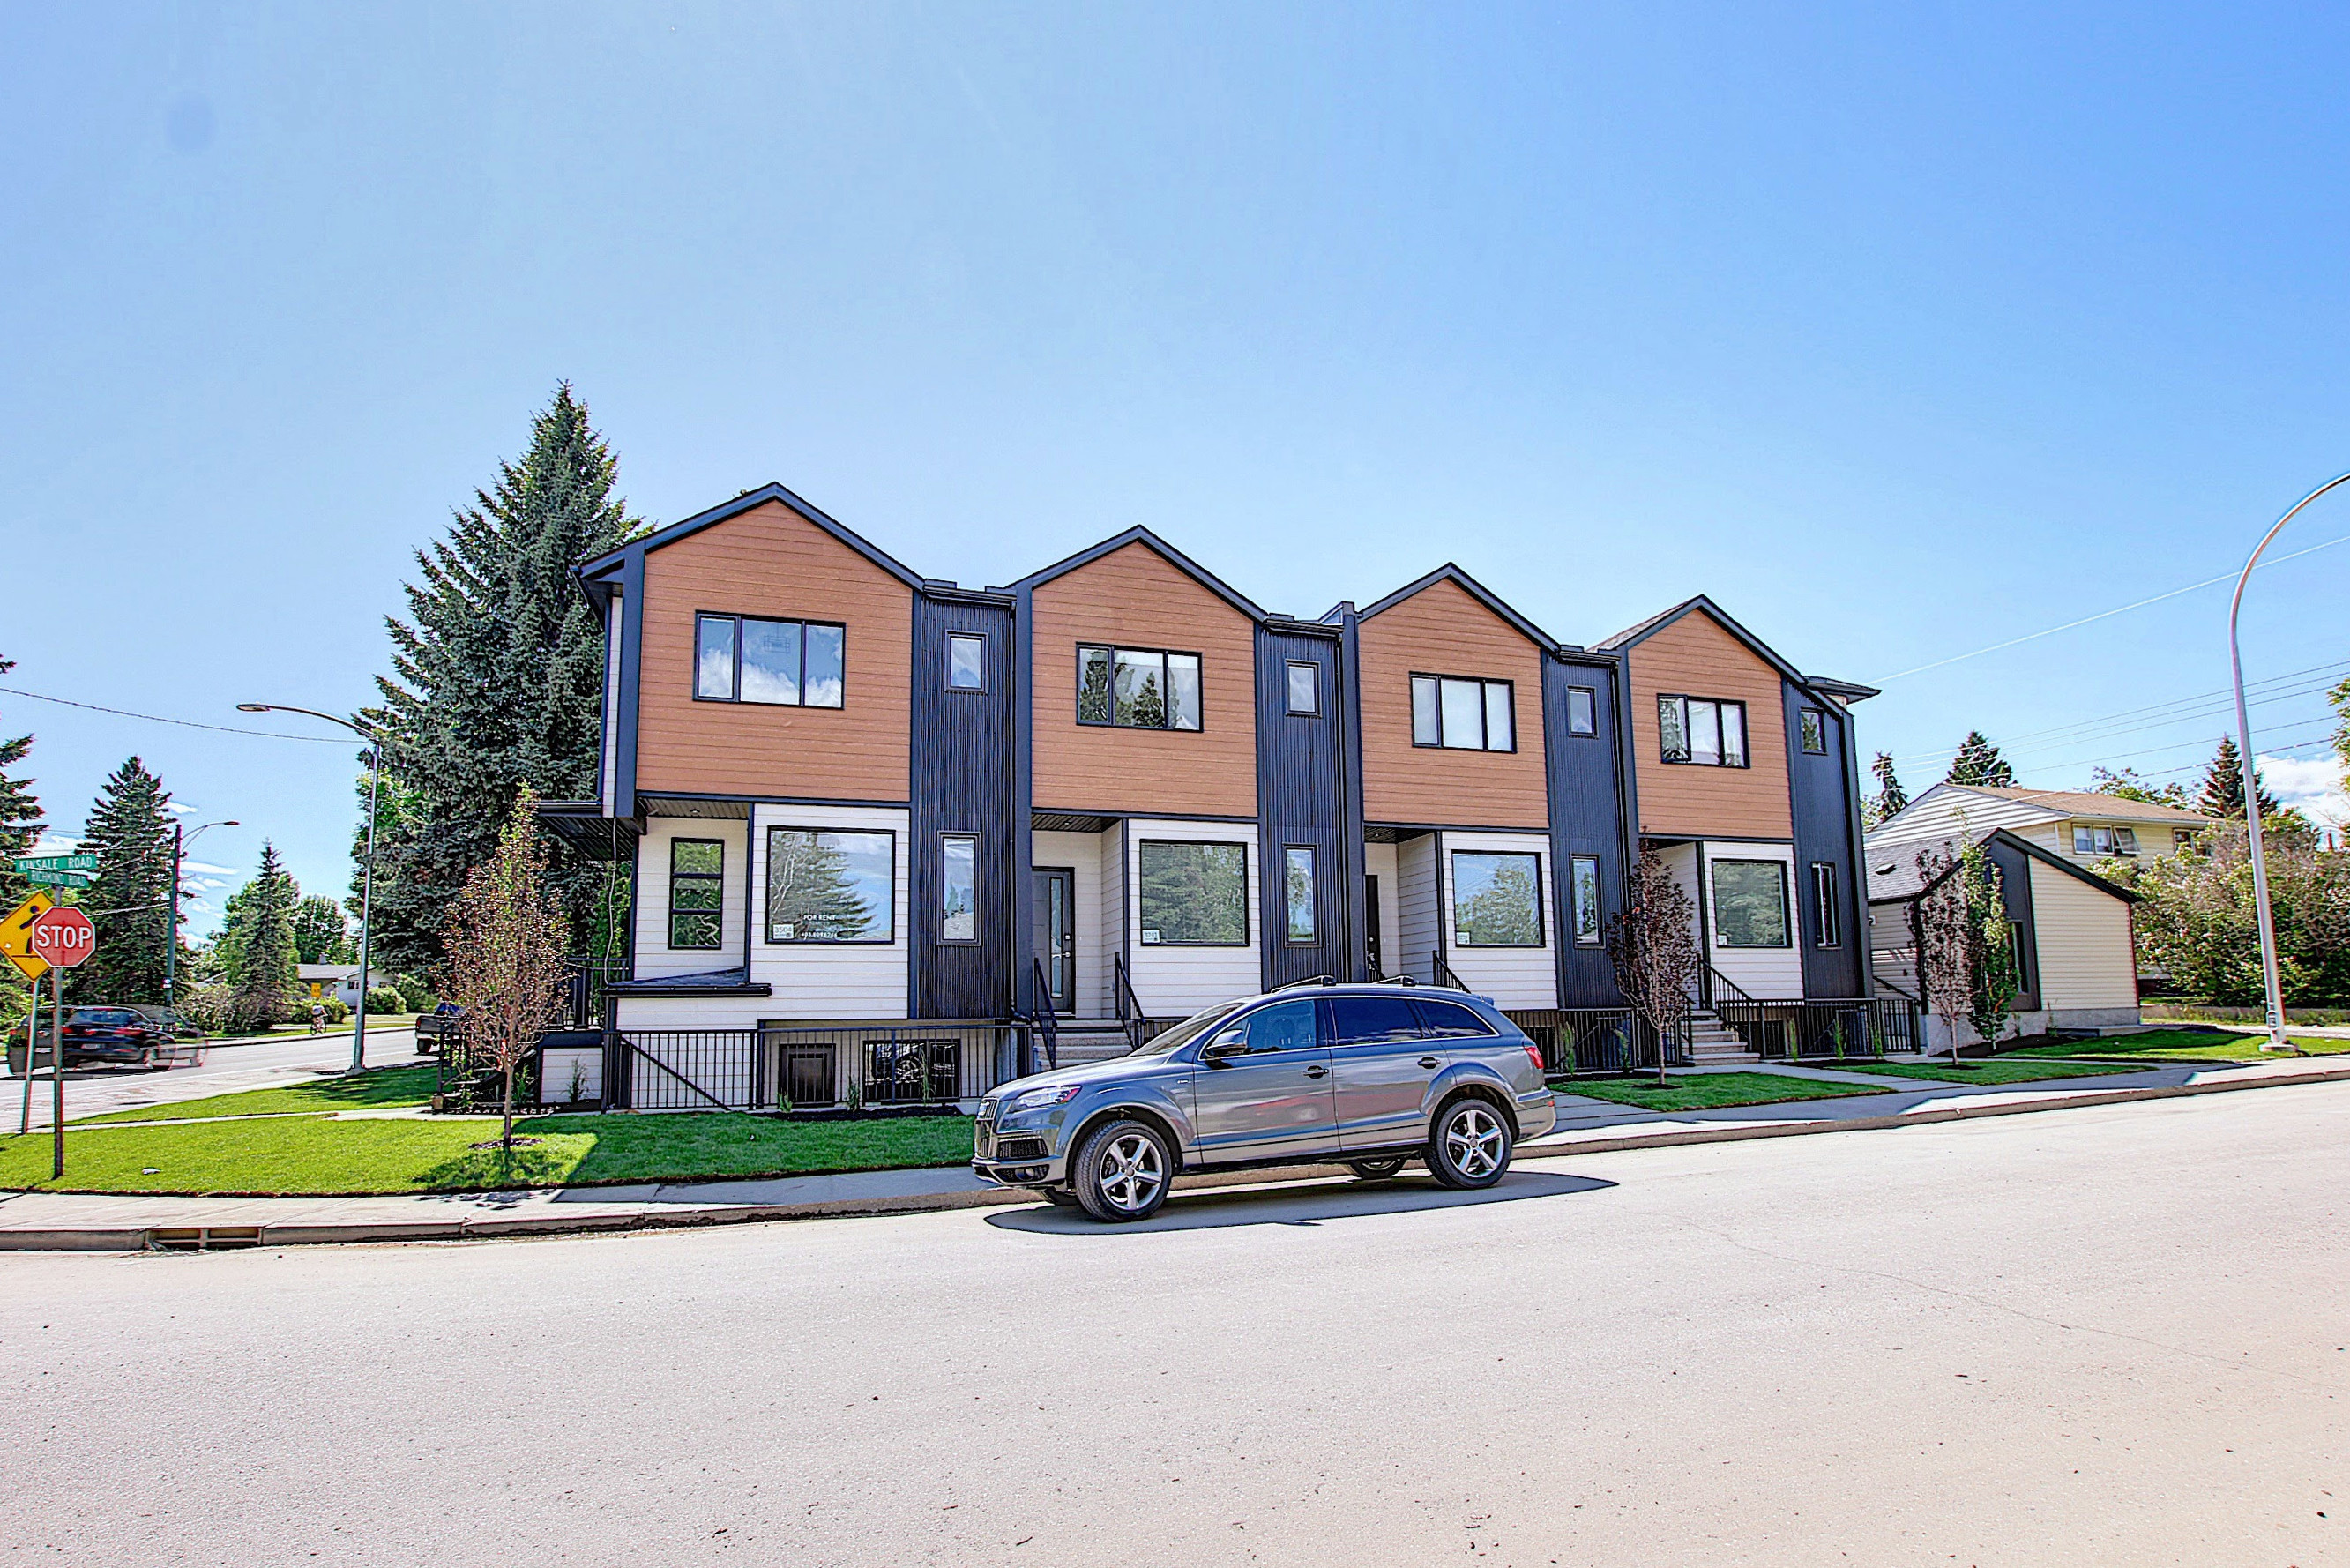 3241 Kinsale Road SW, Calgary, Alberta T3E 4S1, 2 Bedrooms Bedrooms, ,2 BathroomsBathrooms,Townhouse,For Rent,Kinsale Road SW,1125